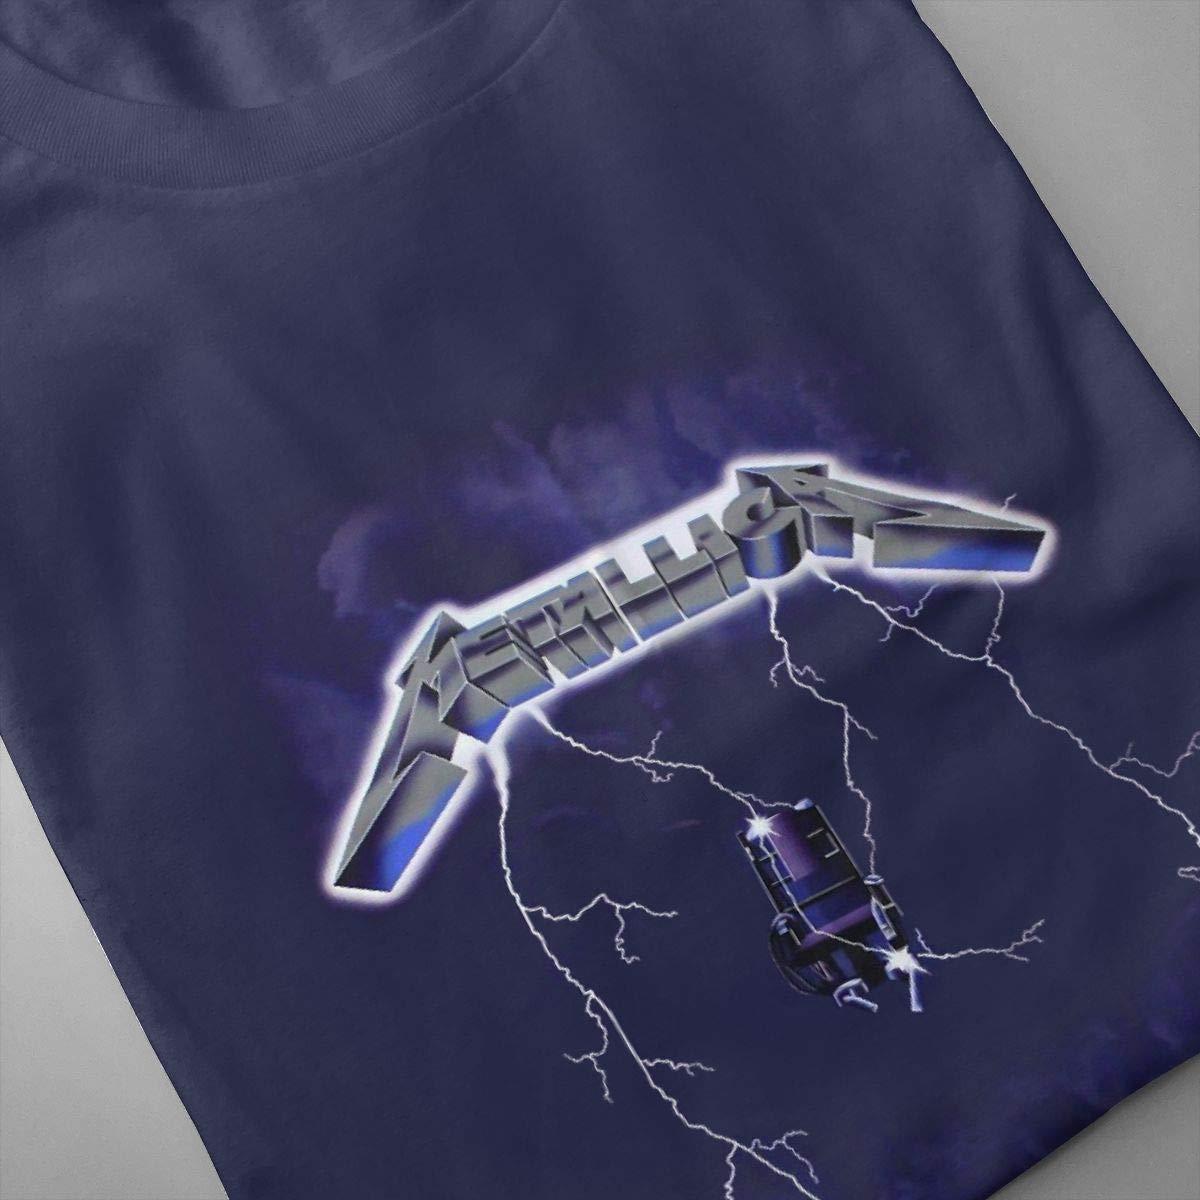 SHENGN Man Design Sweaty Metallica Short Sleeve Humor T-Shirt Black